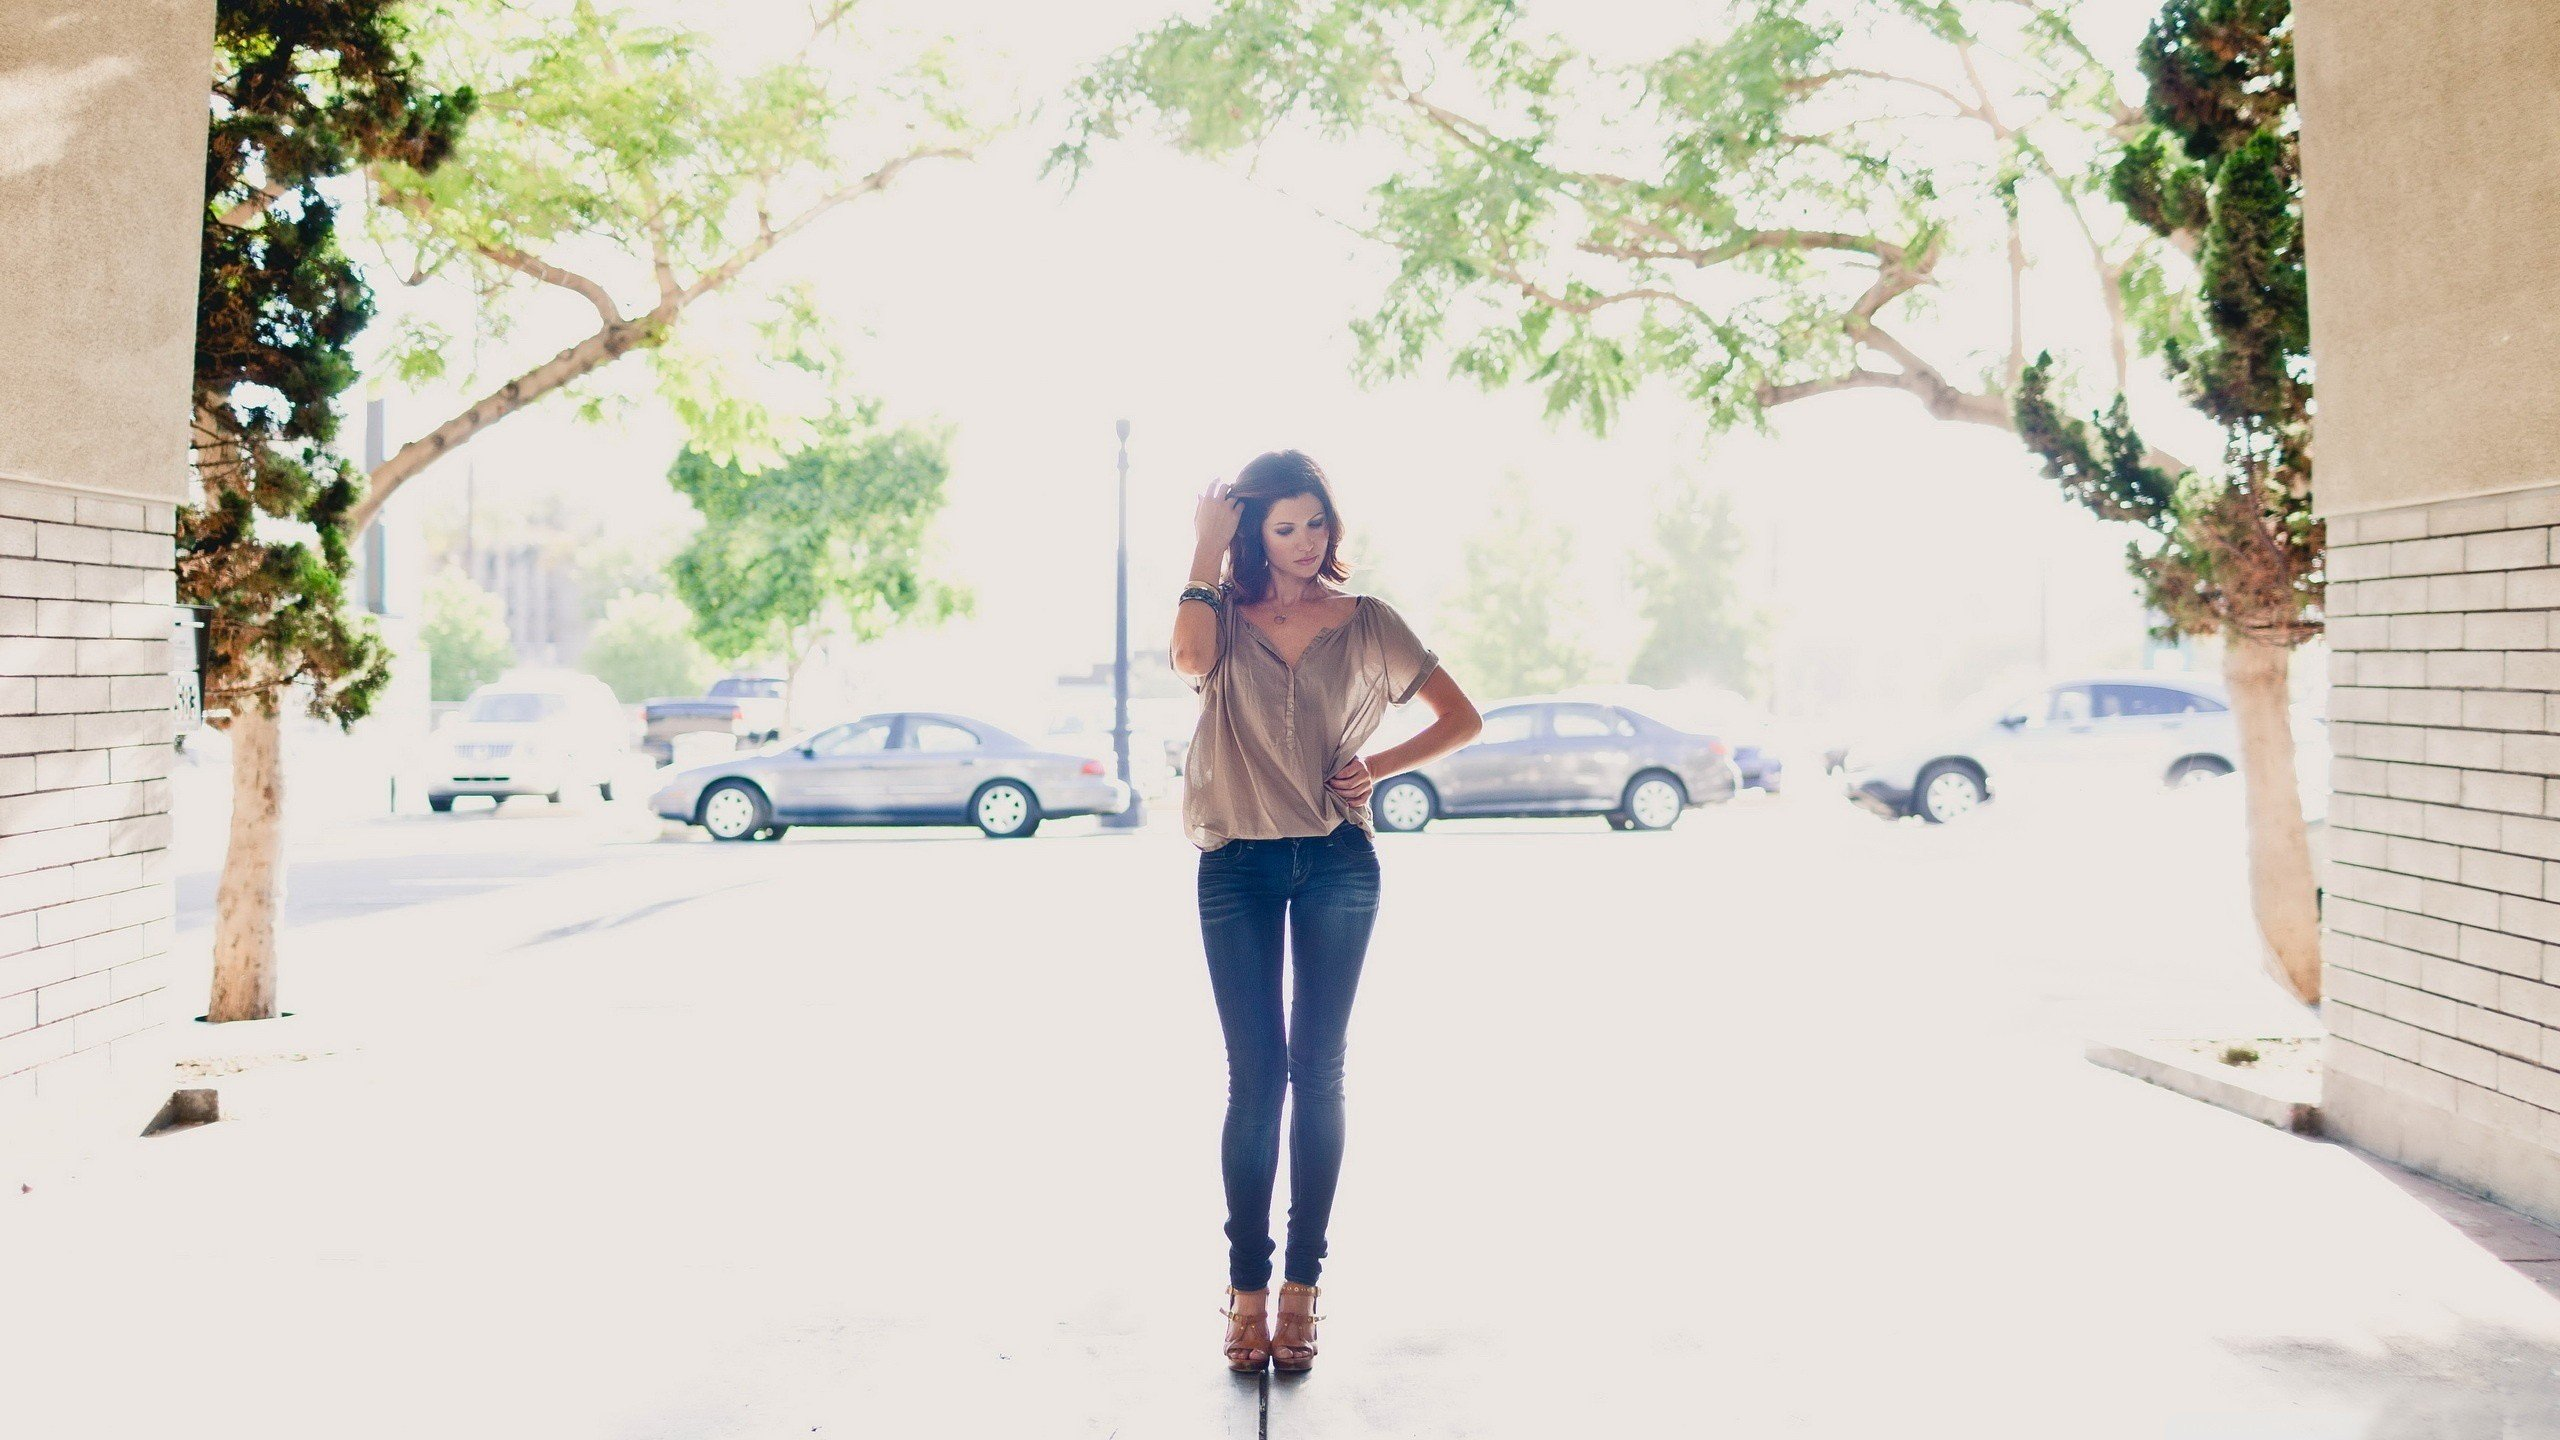 women, Model, Car, Walls, Trees, Women outdoors Wallpaper